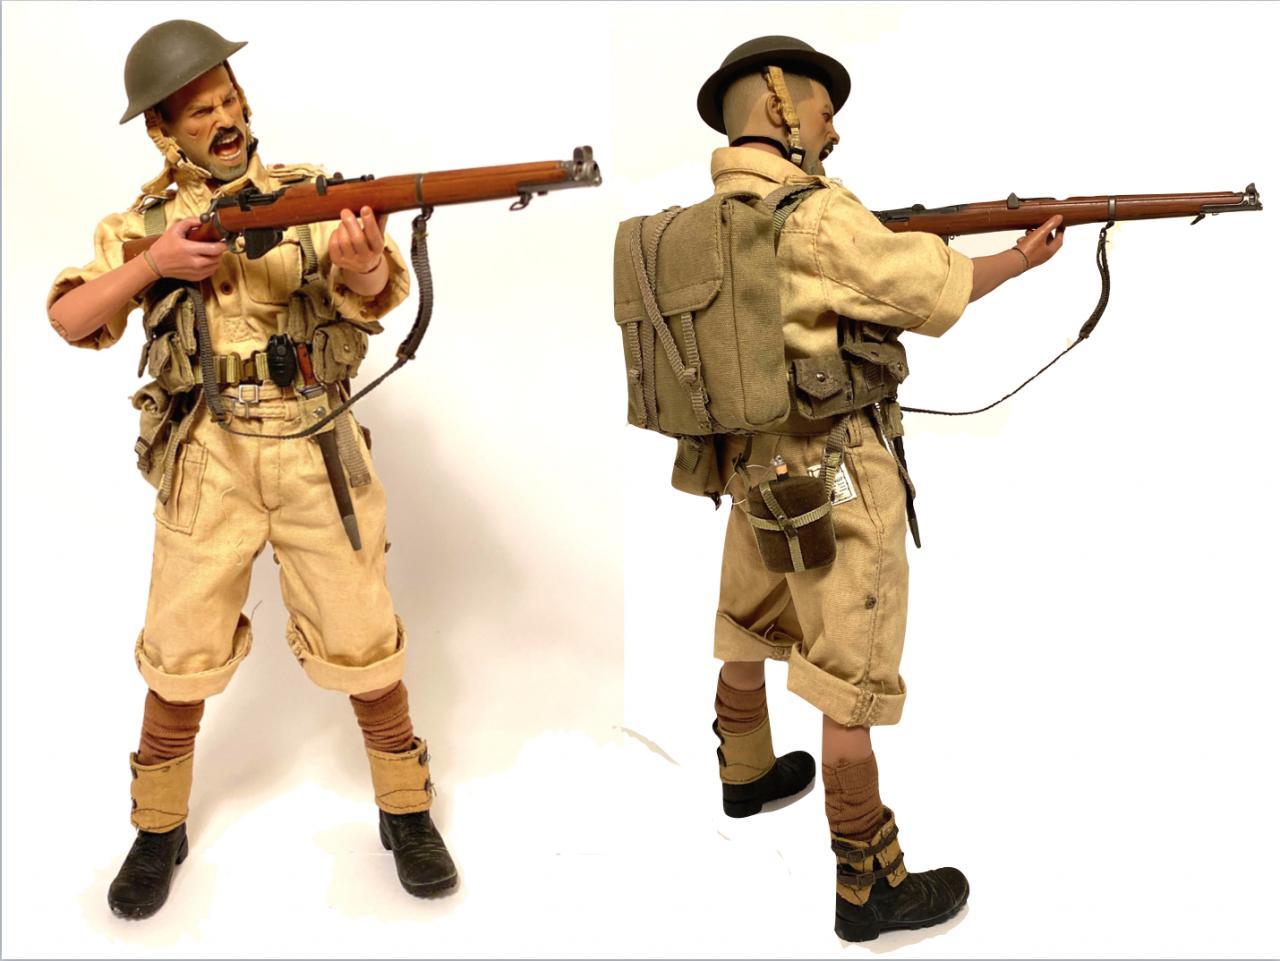 1942 Malaya. No Surrender-screen-shot-2020-05-21-10-52-21-am-jpg